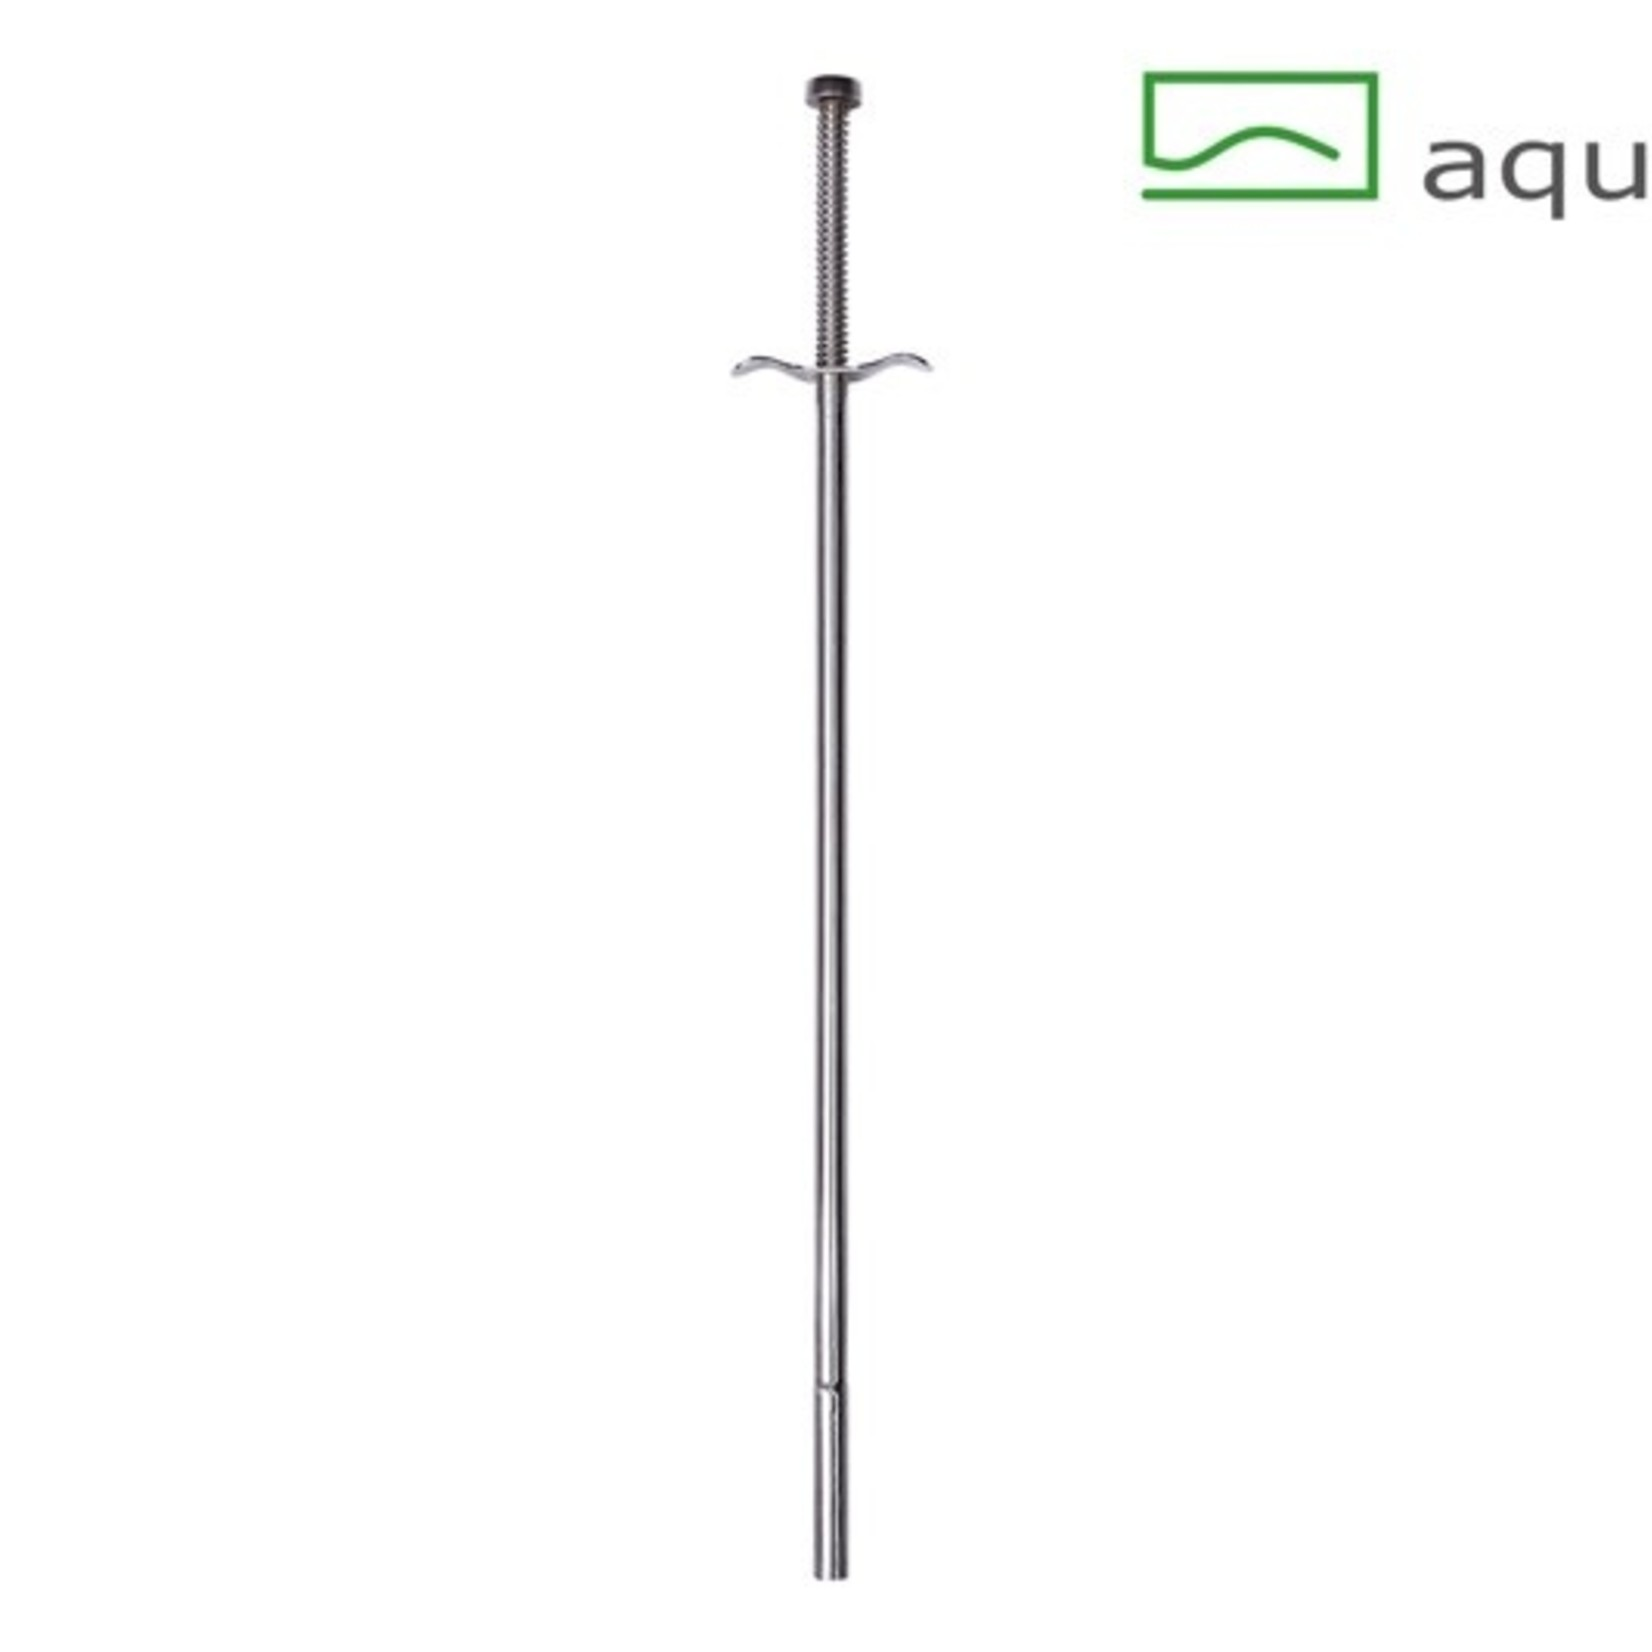 Aqua-Art Applicateur pour Planta Gainer